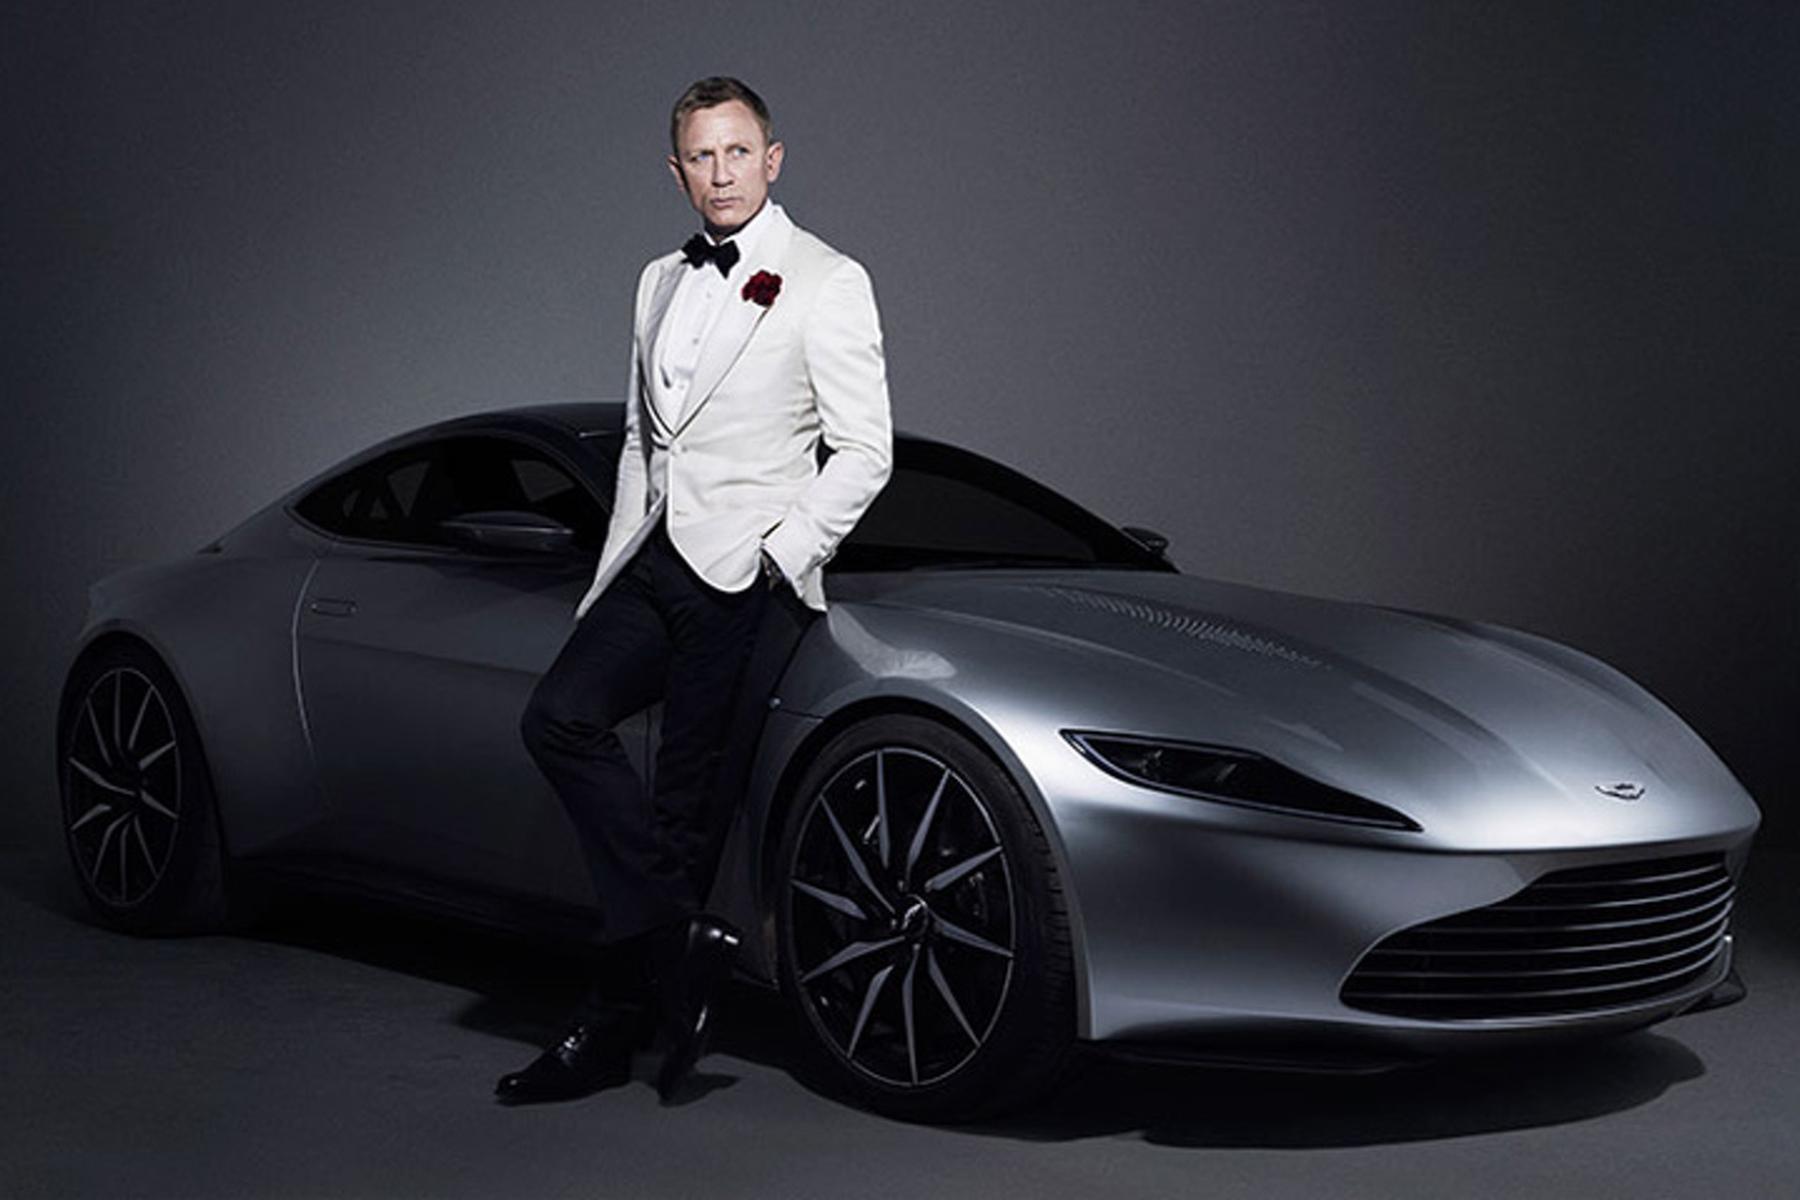 Aston Martin DB10 with Daniel Craig from Spectre